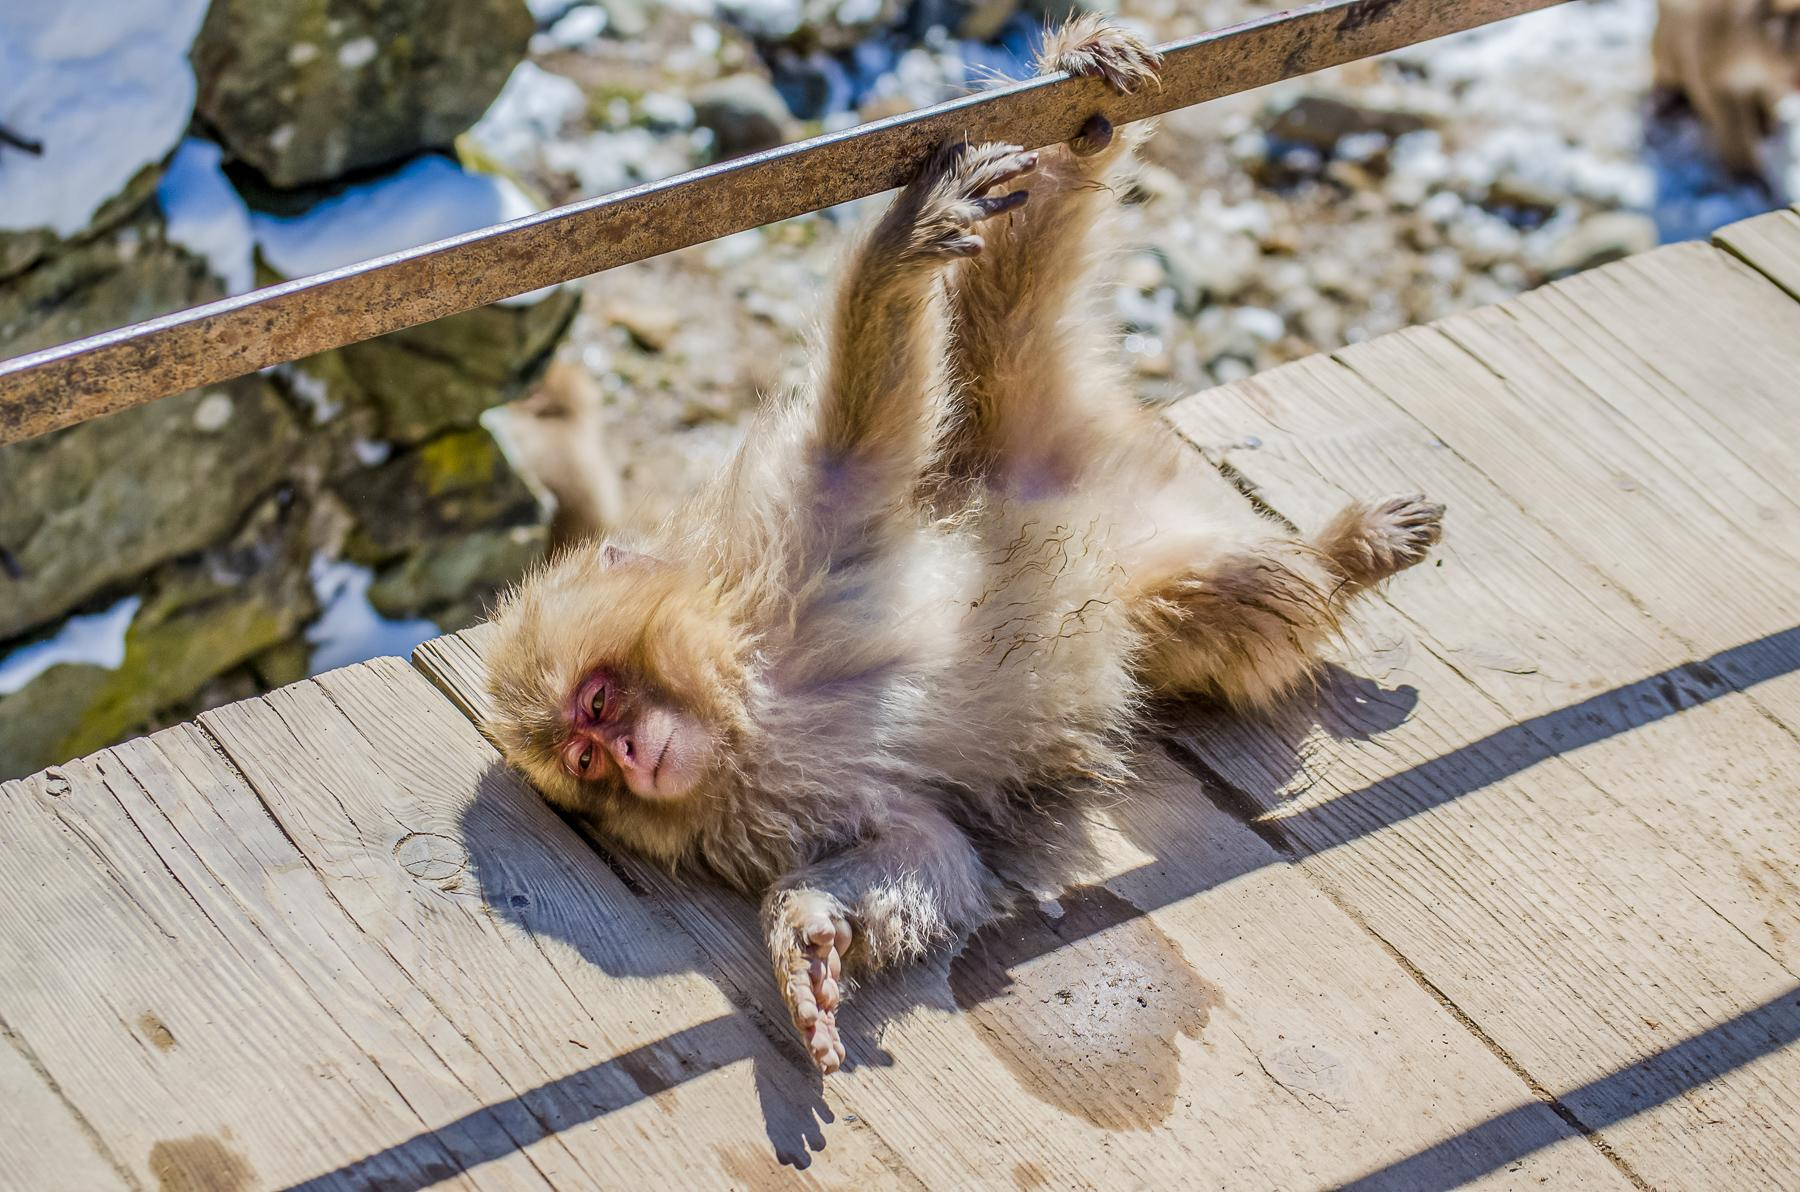 Jigokudani Monkey Park: Where to See Snow Monkeys Bathing in Japan's Onsens